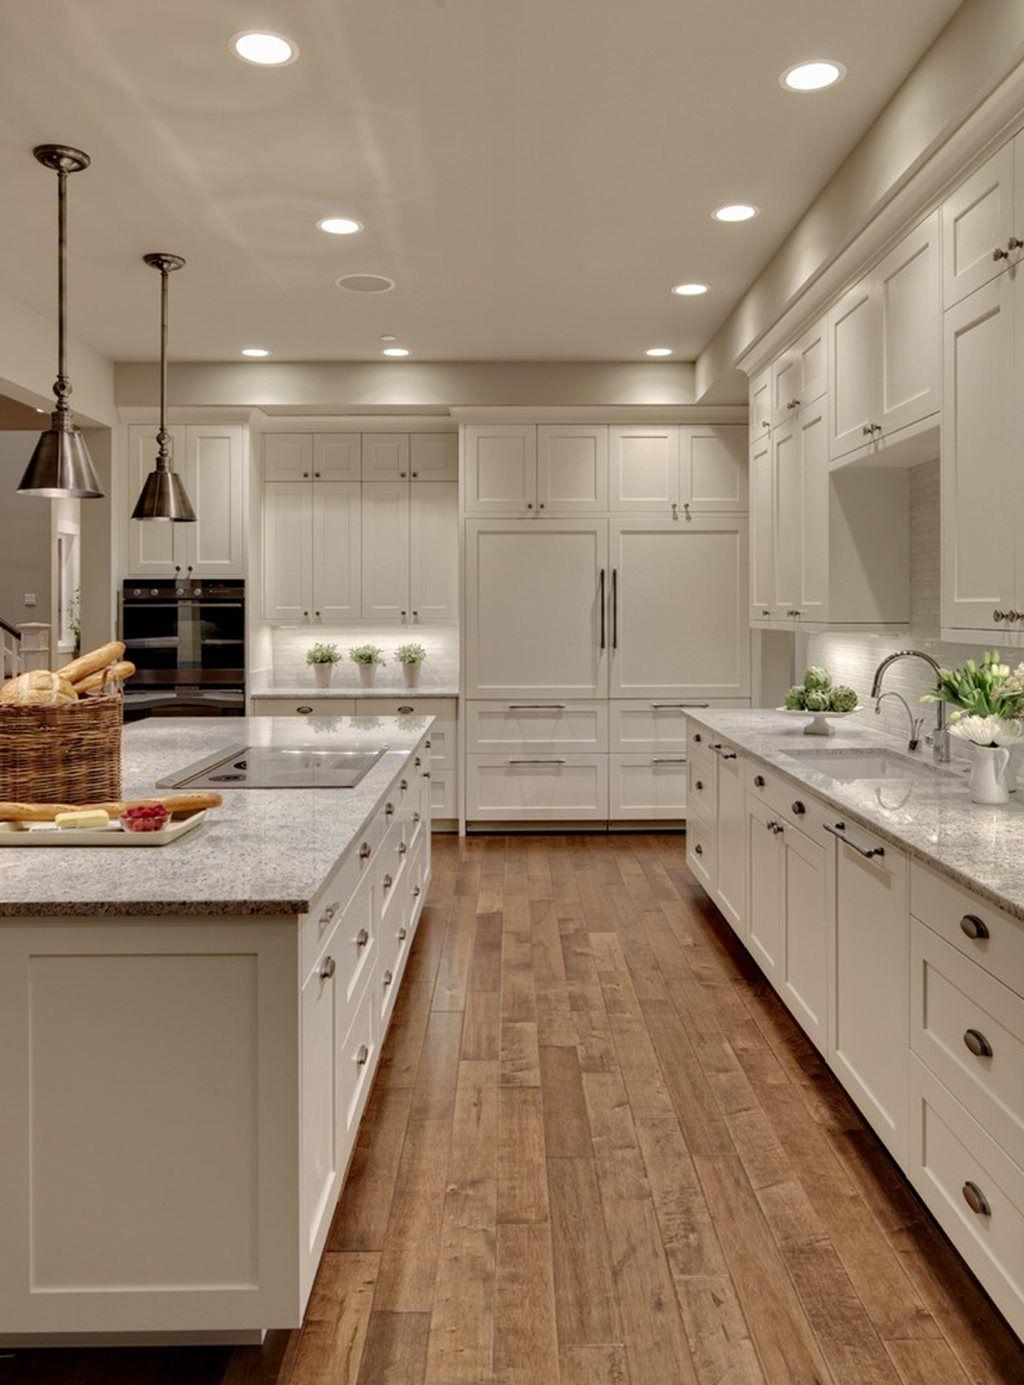 English Styled Kitchen Special Aspects Of Decoration White Kitchen Design Kitchen Cabinet Design Kitchen Renovation